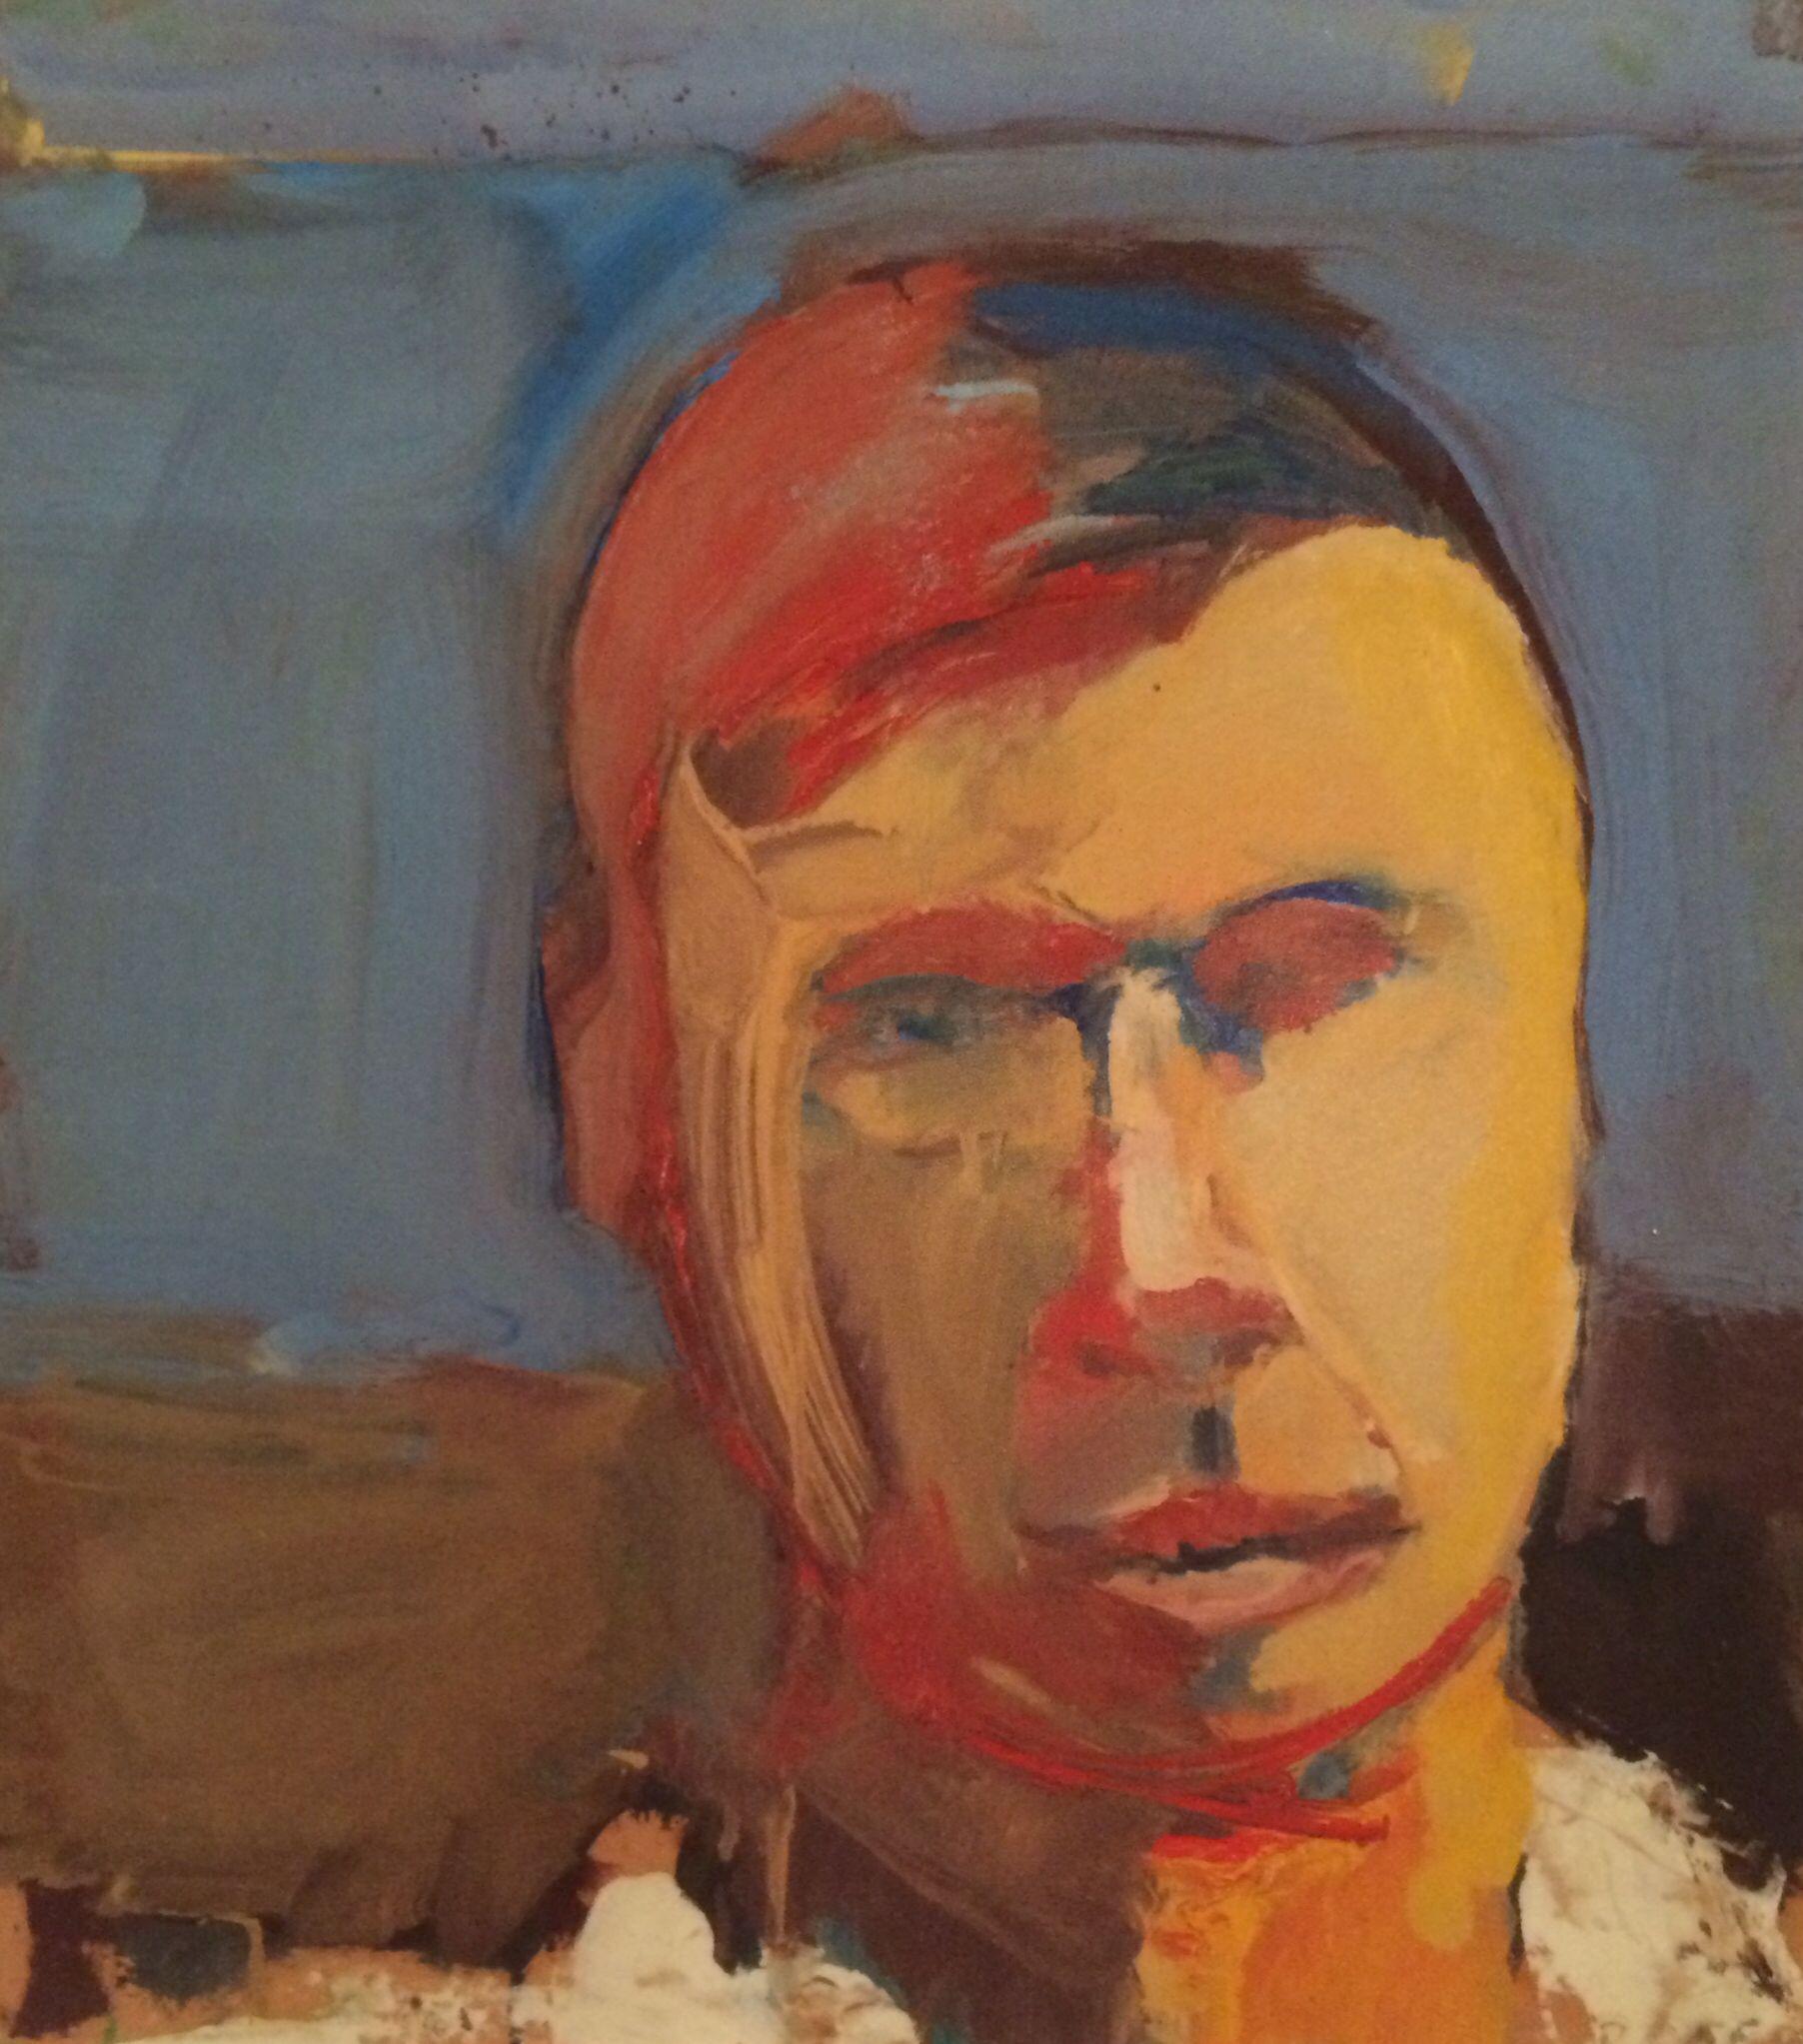 ♀ Painted Art Portraits ♀  Richard Diebenkorn | Self-Portrait, 1956